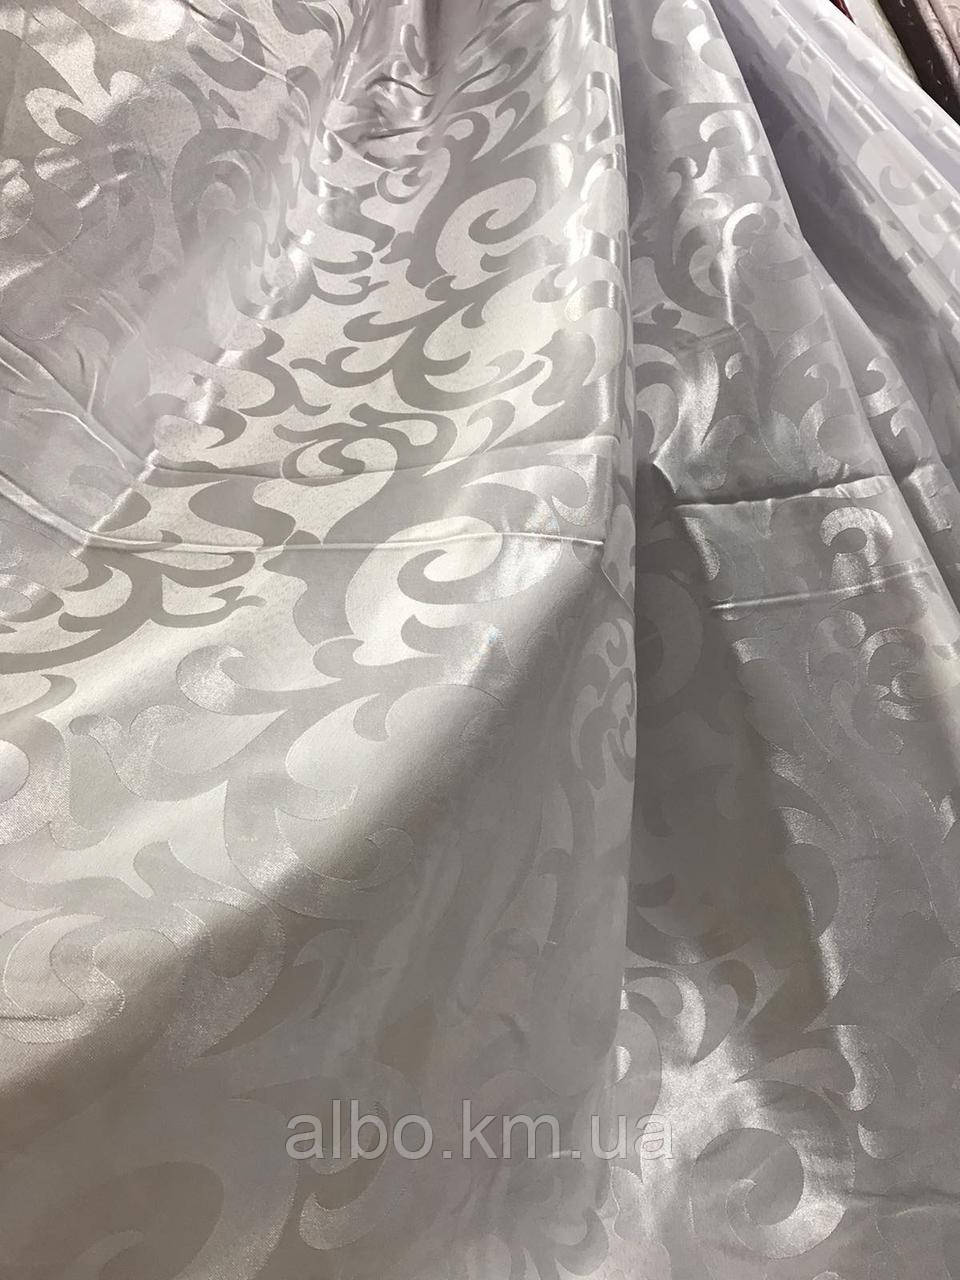 Ткань на метраж жаккардовая белая, высота 2.8м ( С28 - 22 )